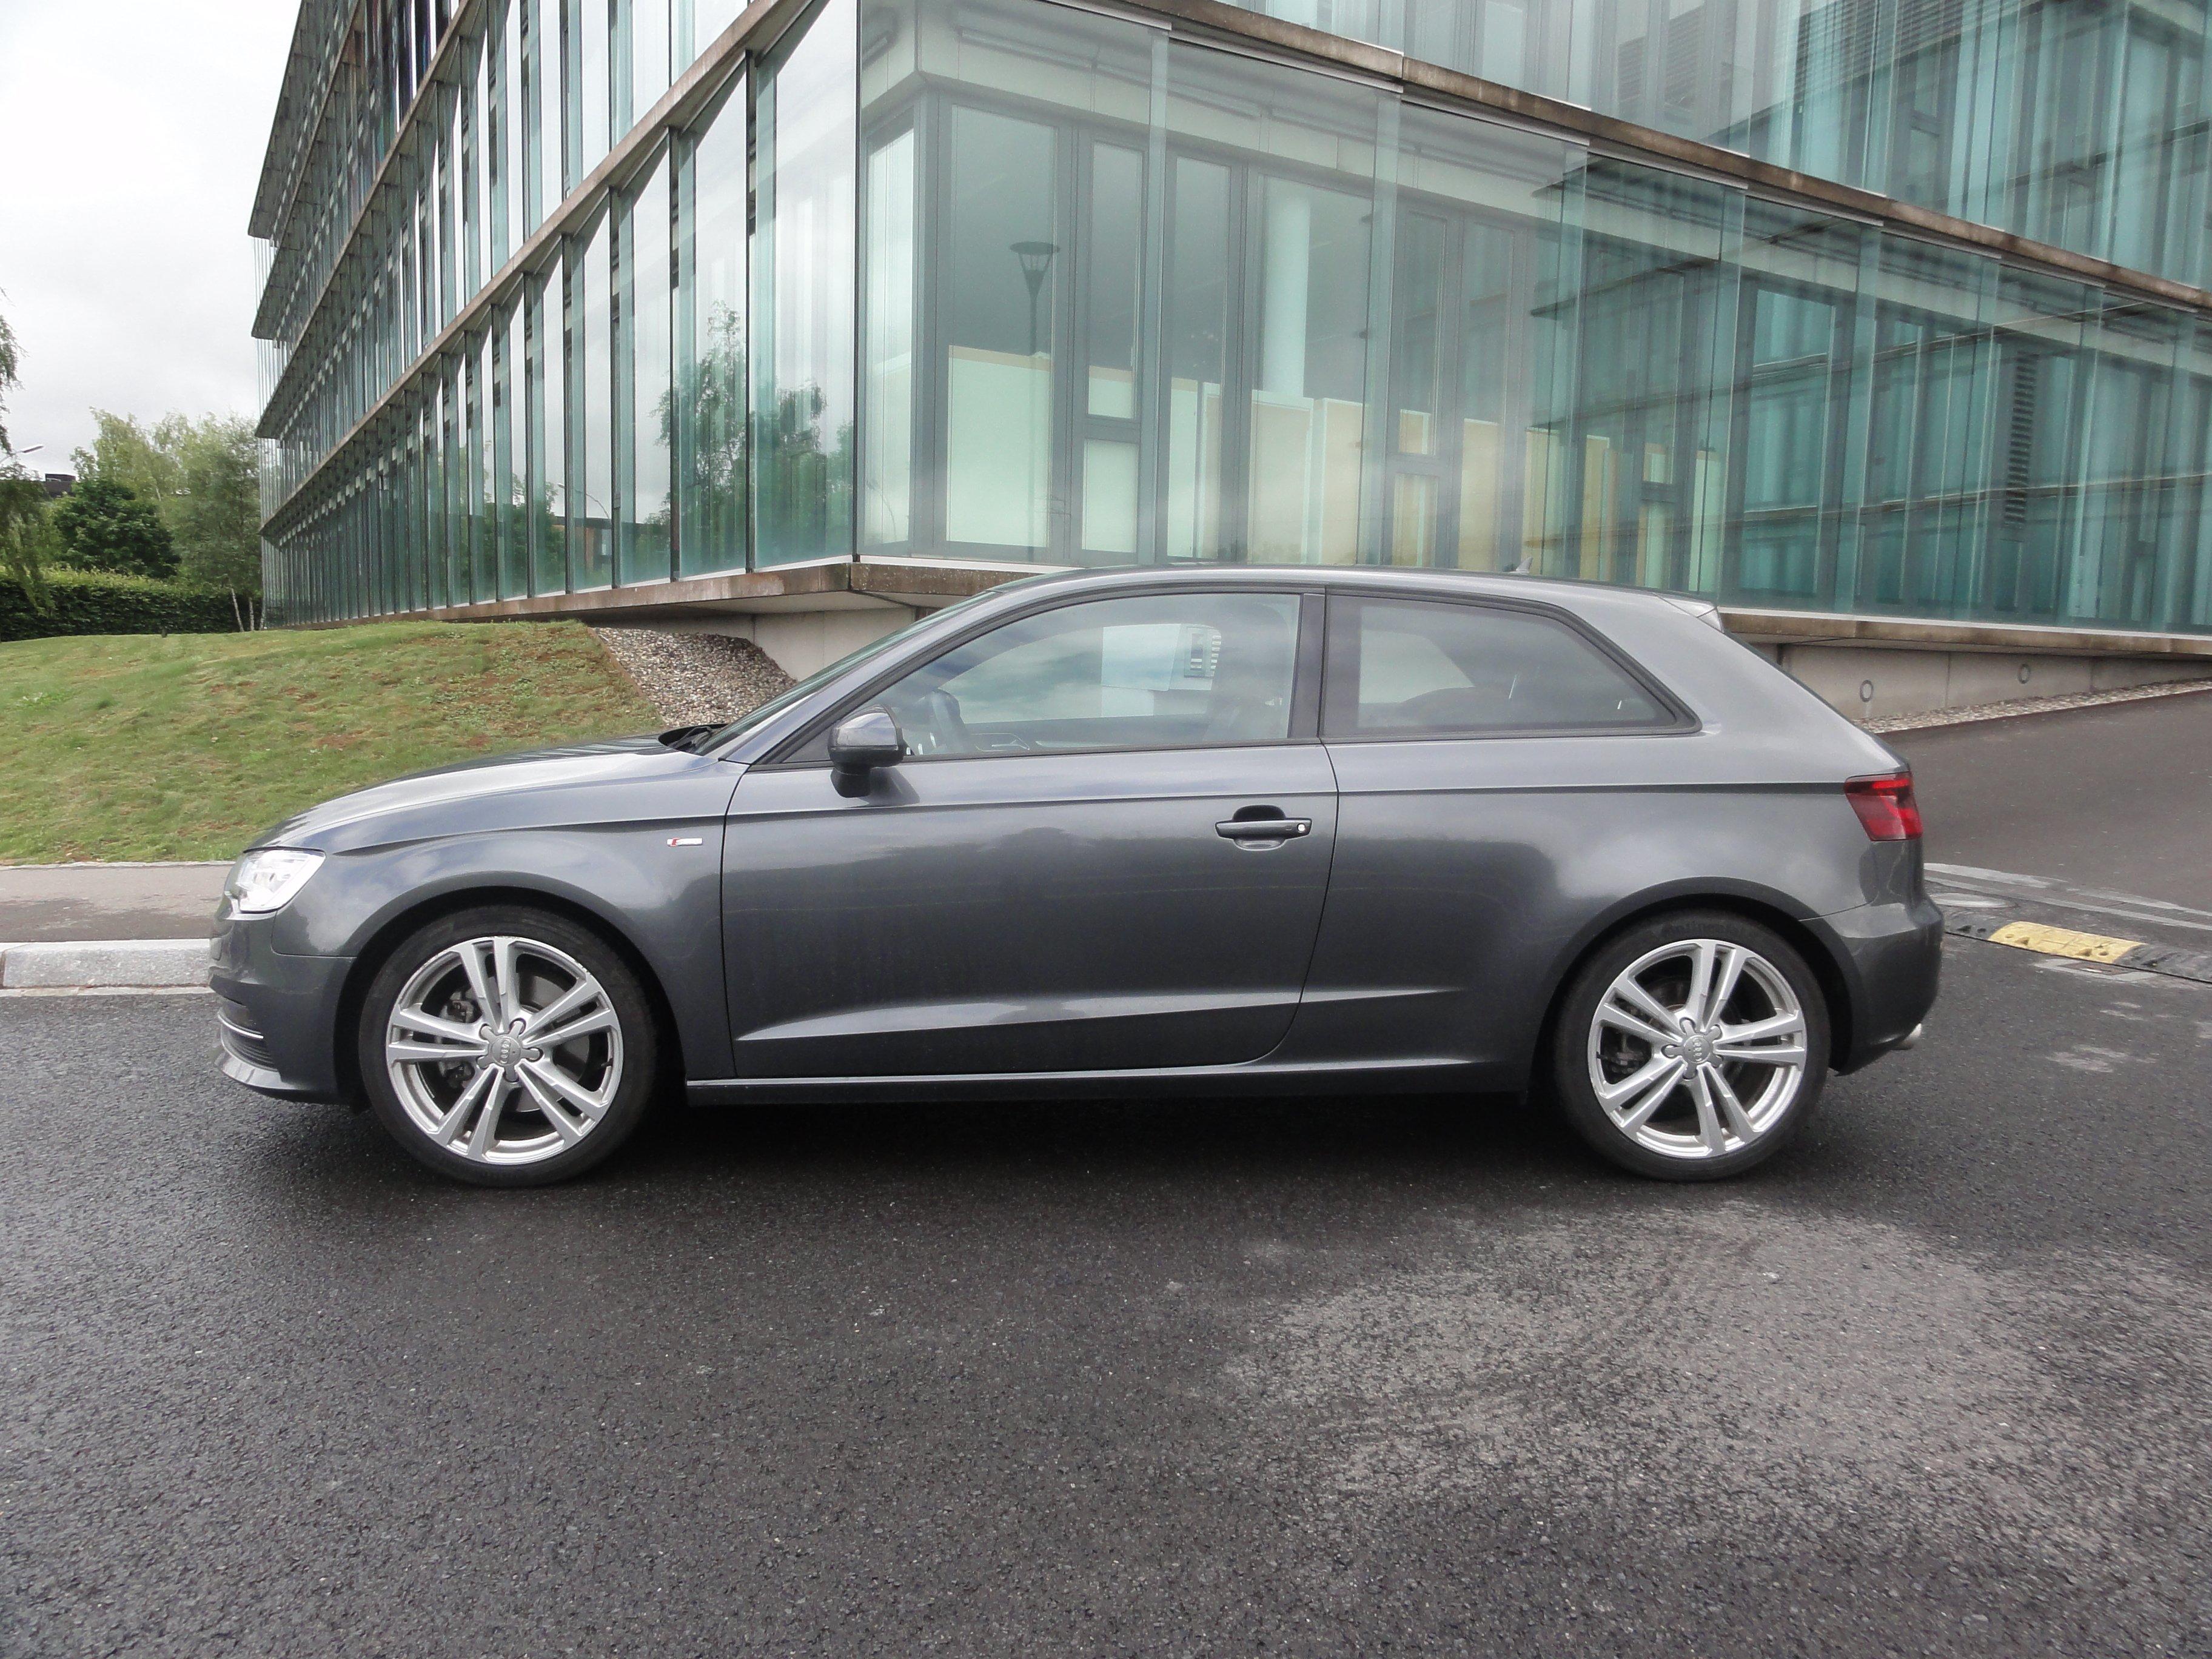 Kekurangan Audi A3 2.0 Tdi Top Model Tahun Ini